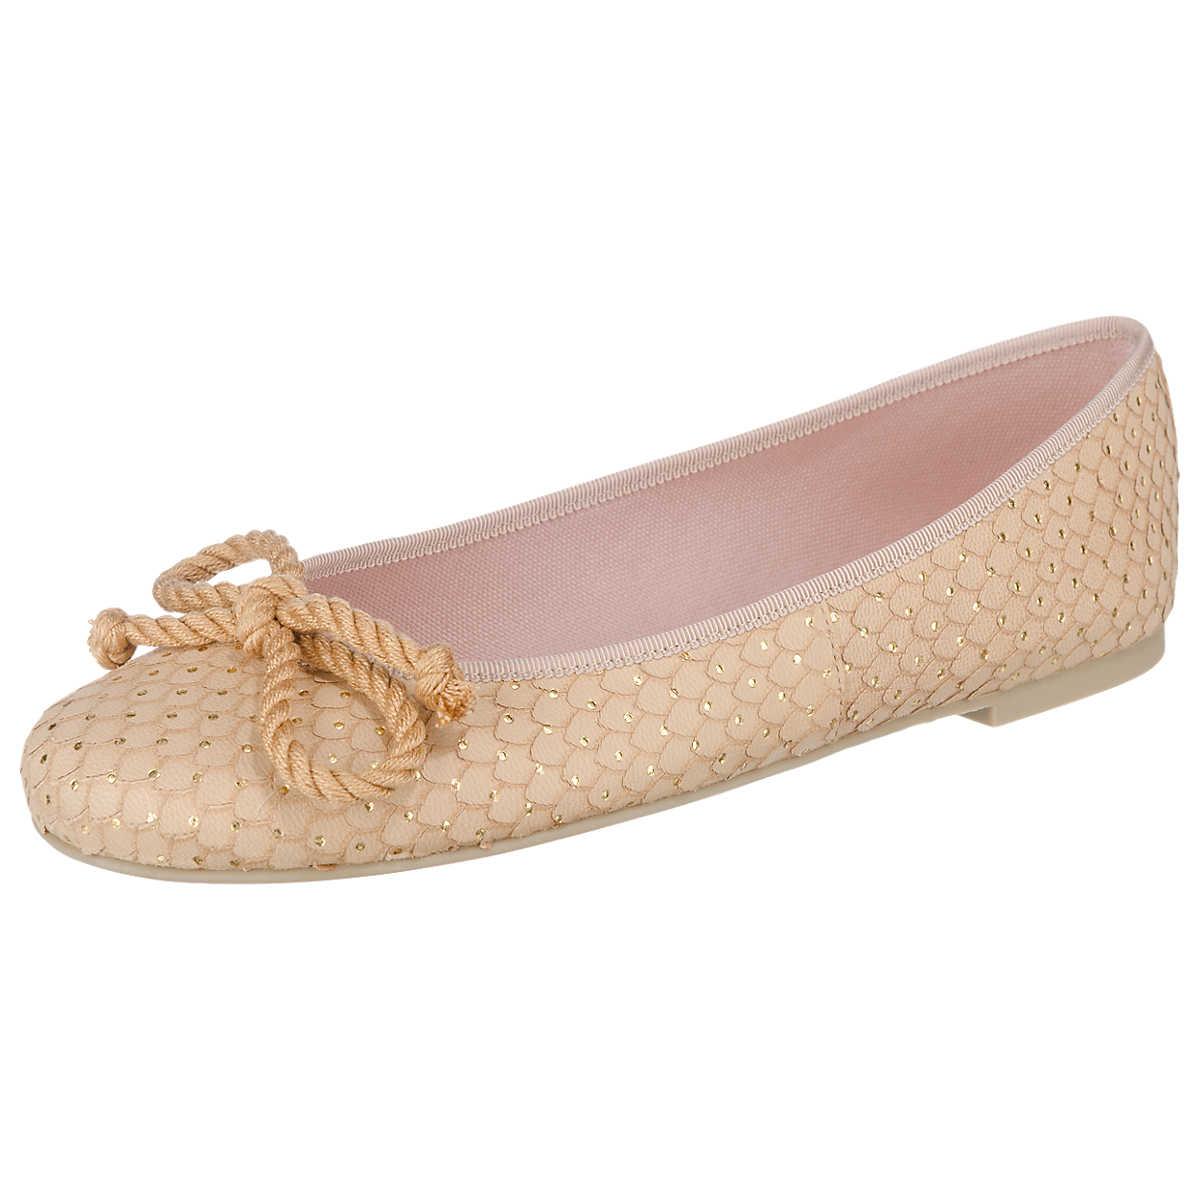 Pretty Ballerinas Ballerinas beige-kombi - Pretty Ballerinas - Ballerinas - Schuhe - mirapodo.de